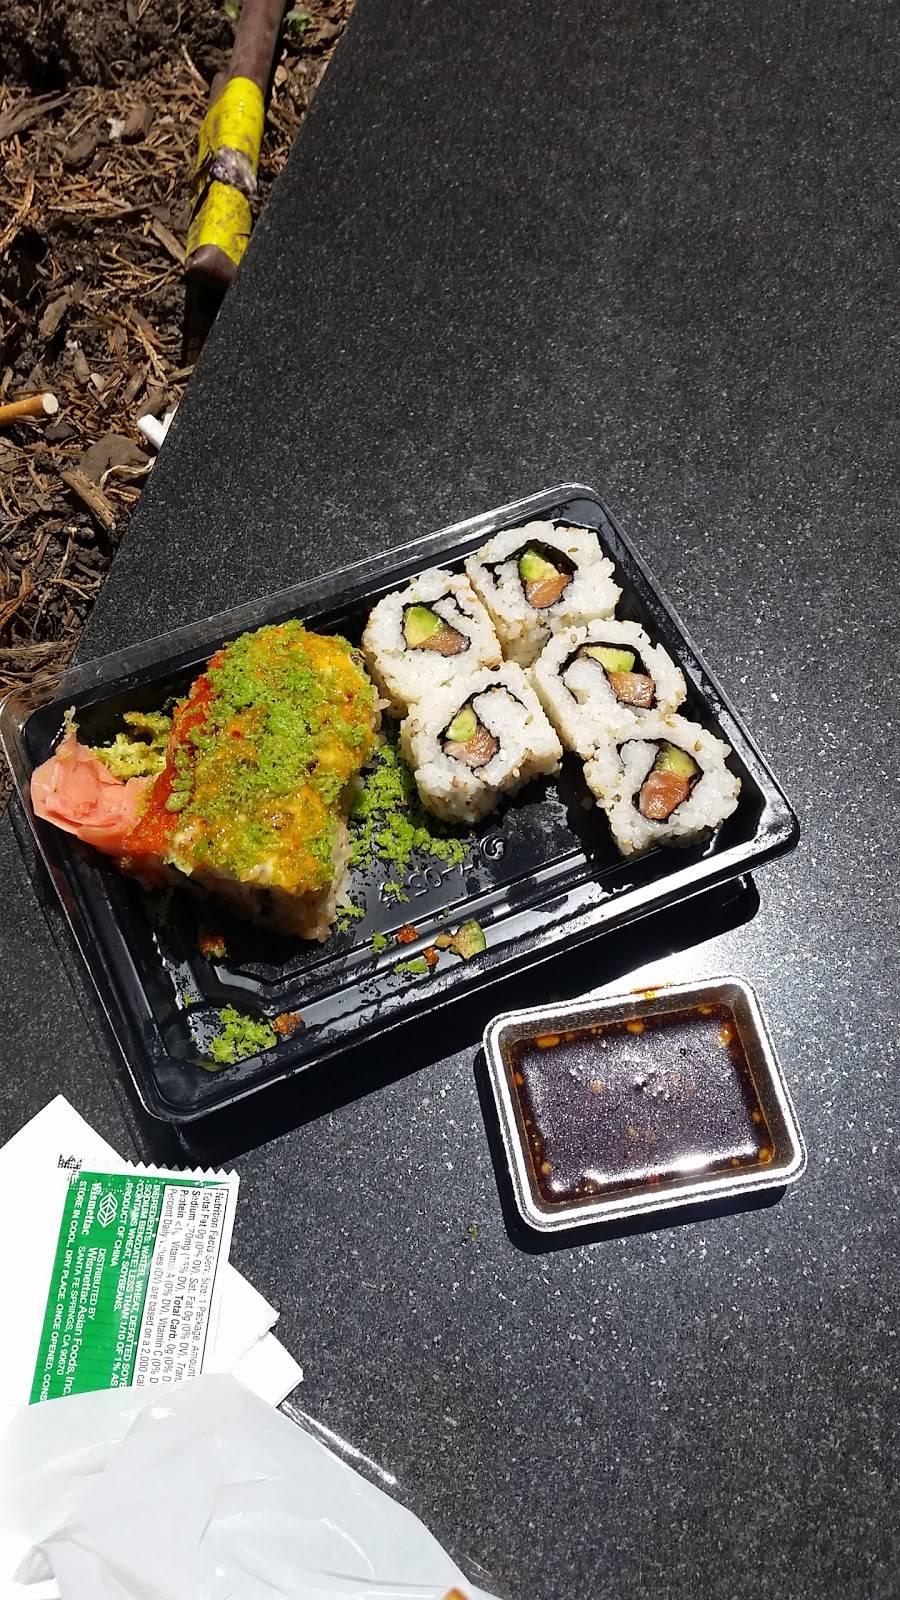 I Love Sushi   restaurant   233 N Michigan Ave, Chicago, IL 60601, USA   3122280500 OR +1 312-228-0500